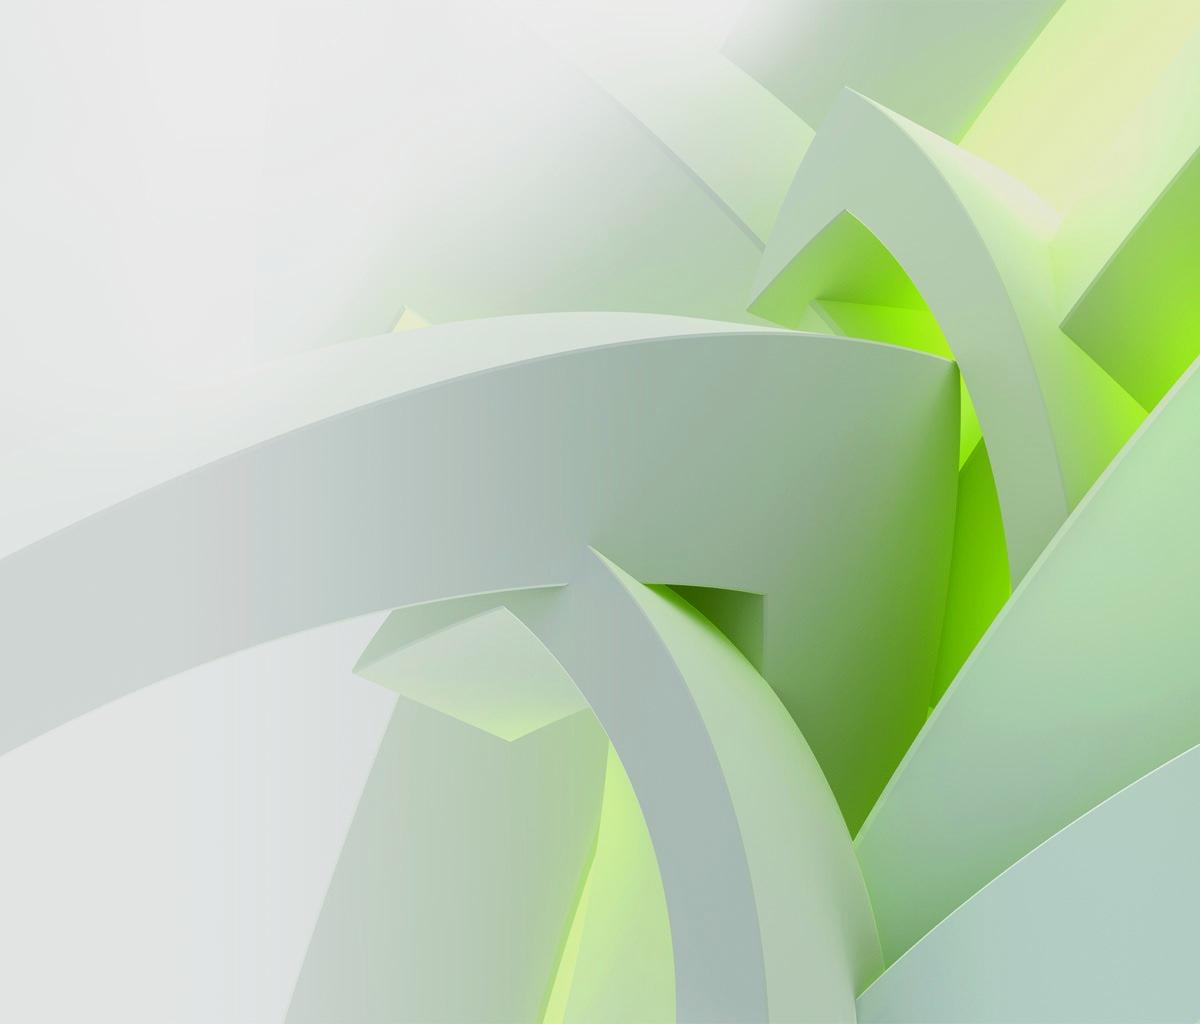 LG Optimus 2X Wallpapers